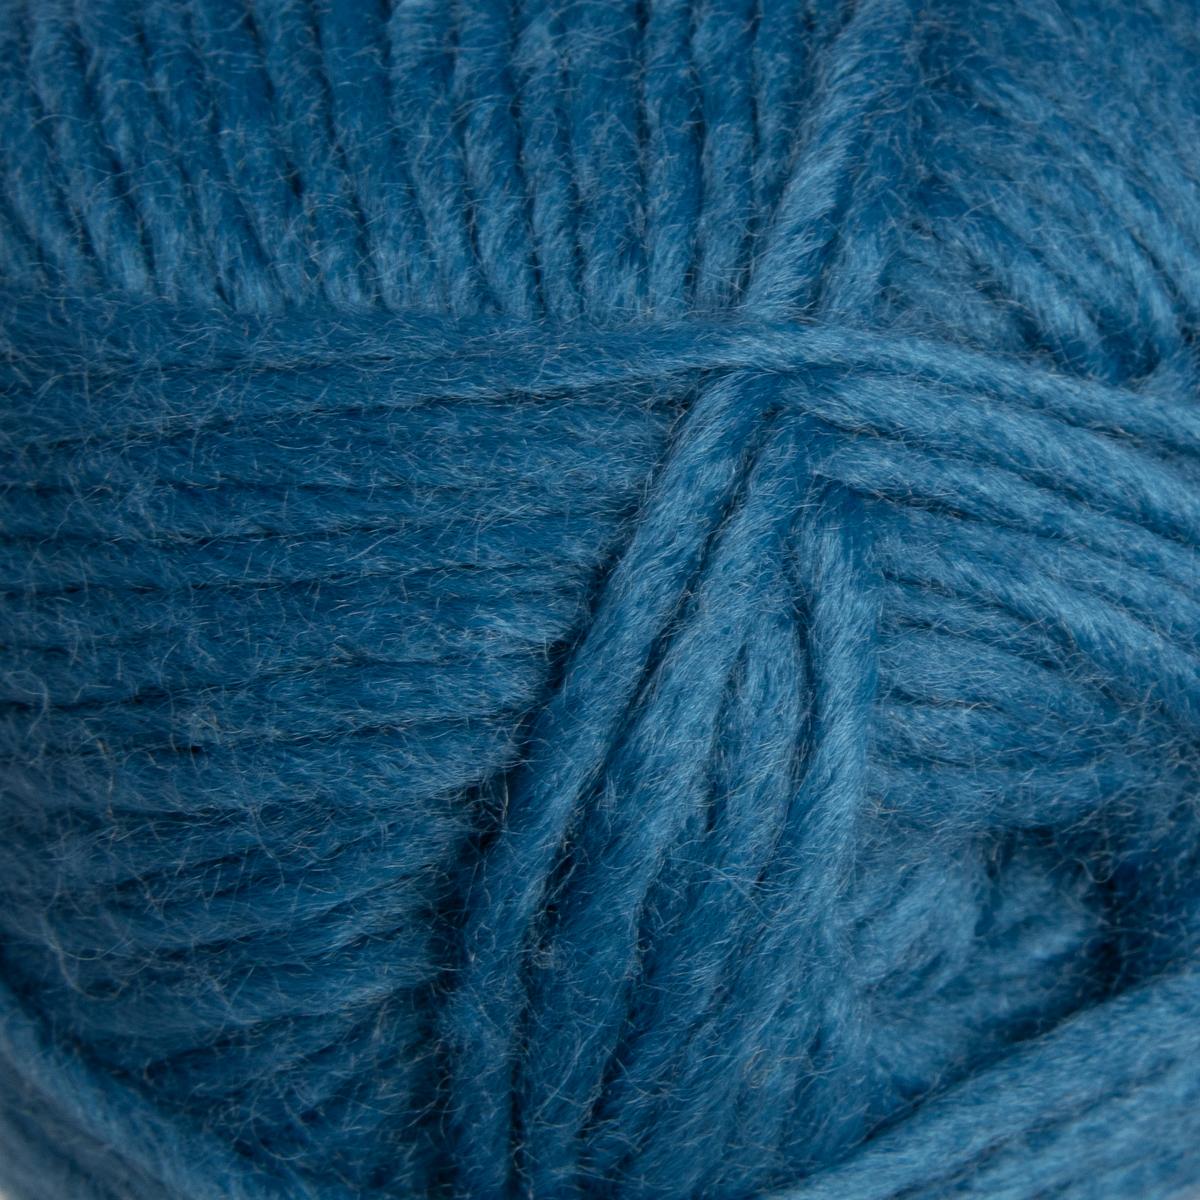 3pk-Lion-Brand-New-Basic-Acrylic-amp-Wool-Yarn-Medium-4-Knit-Crochet-Skeins-Soft thumbnail 71